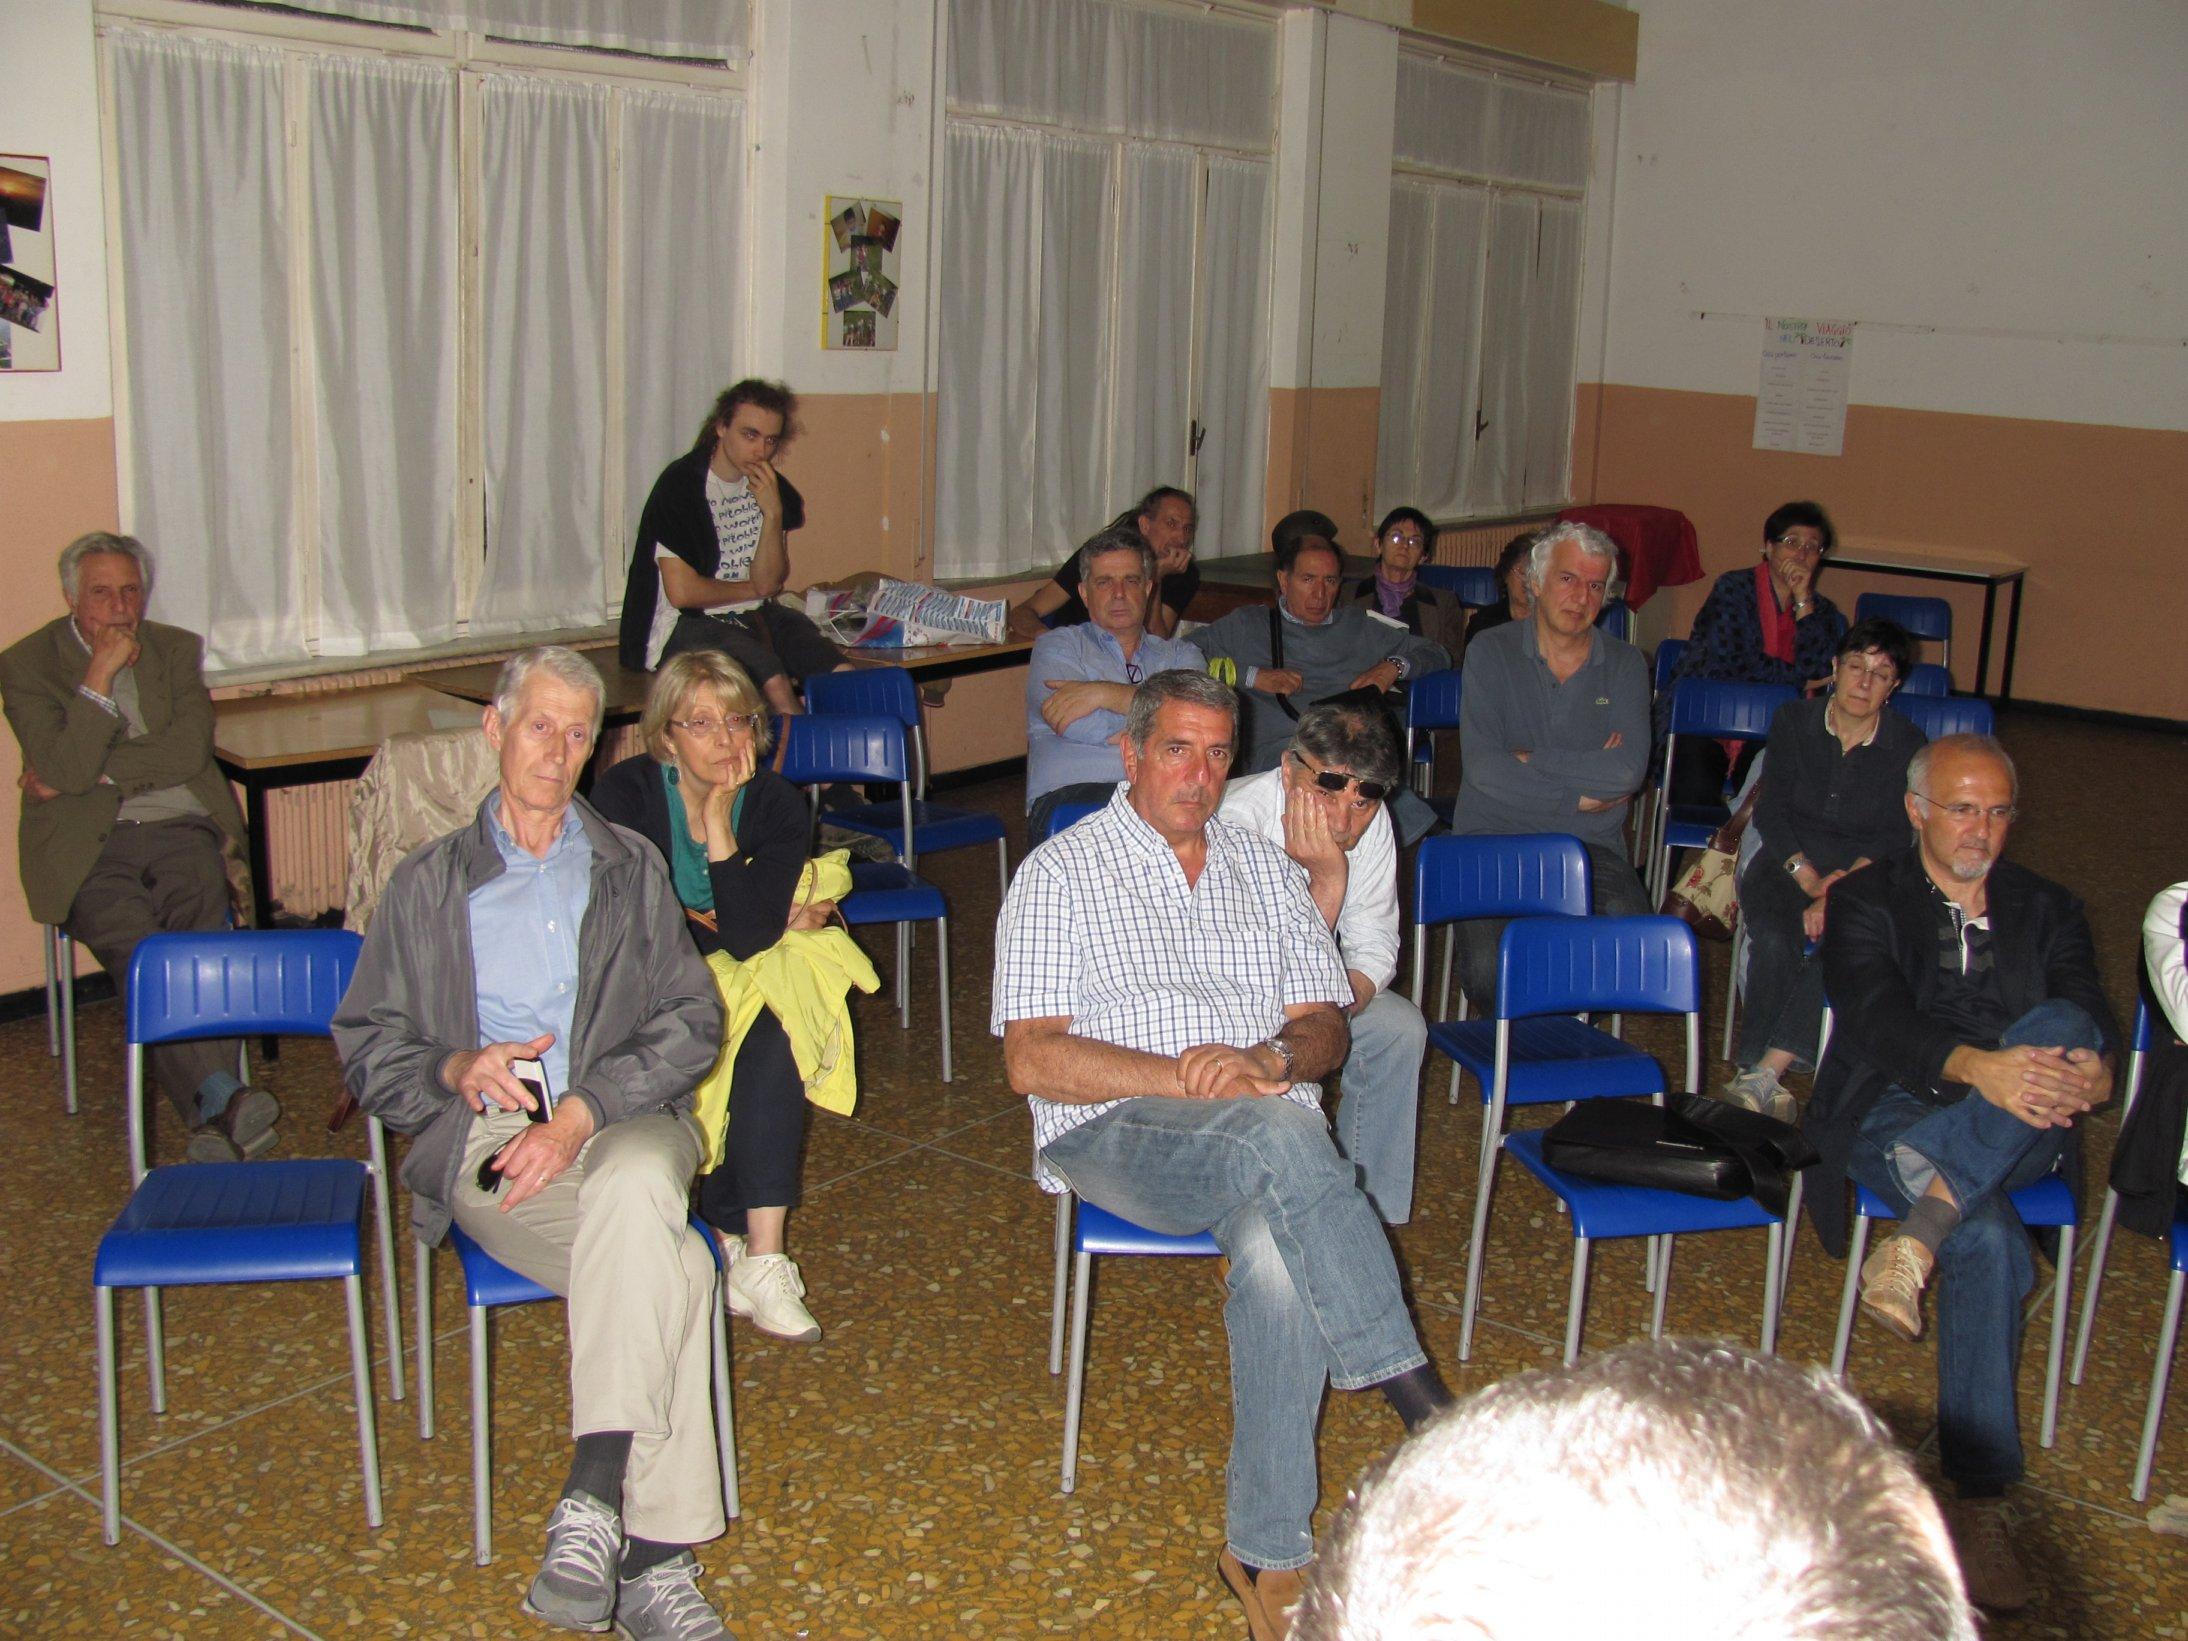 assemblea_gavoglio_2013-06-05-19-44-20